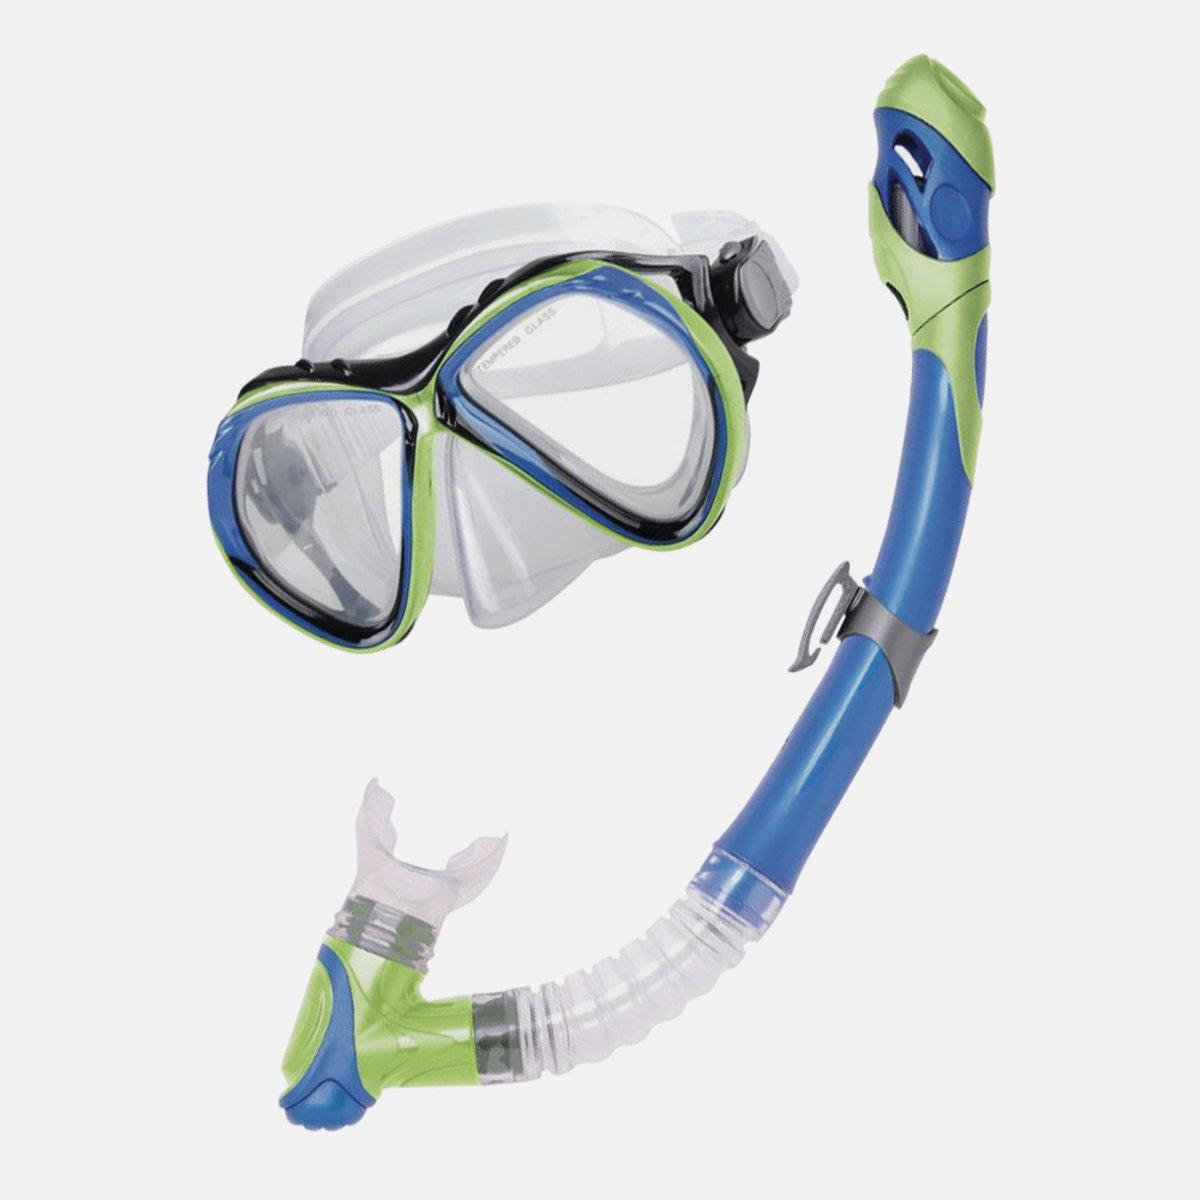 Curacao SR. Adult Advanced Series Snorkel & Mask Combo